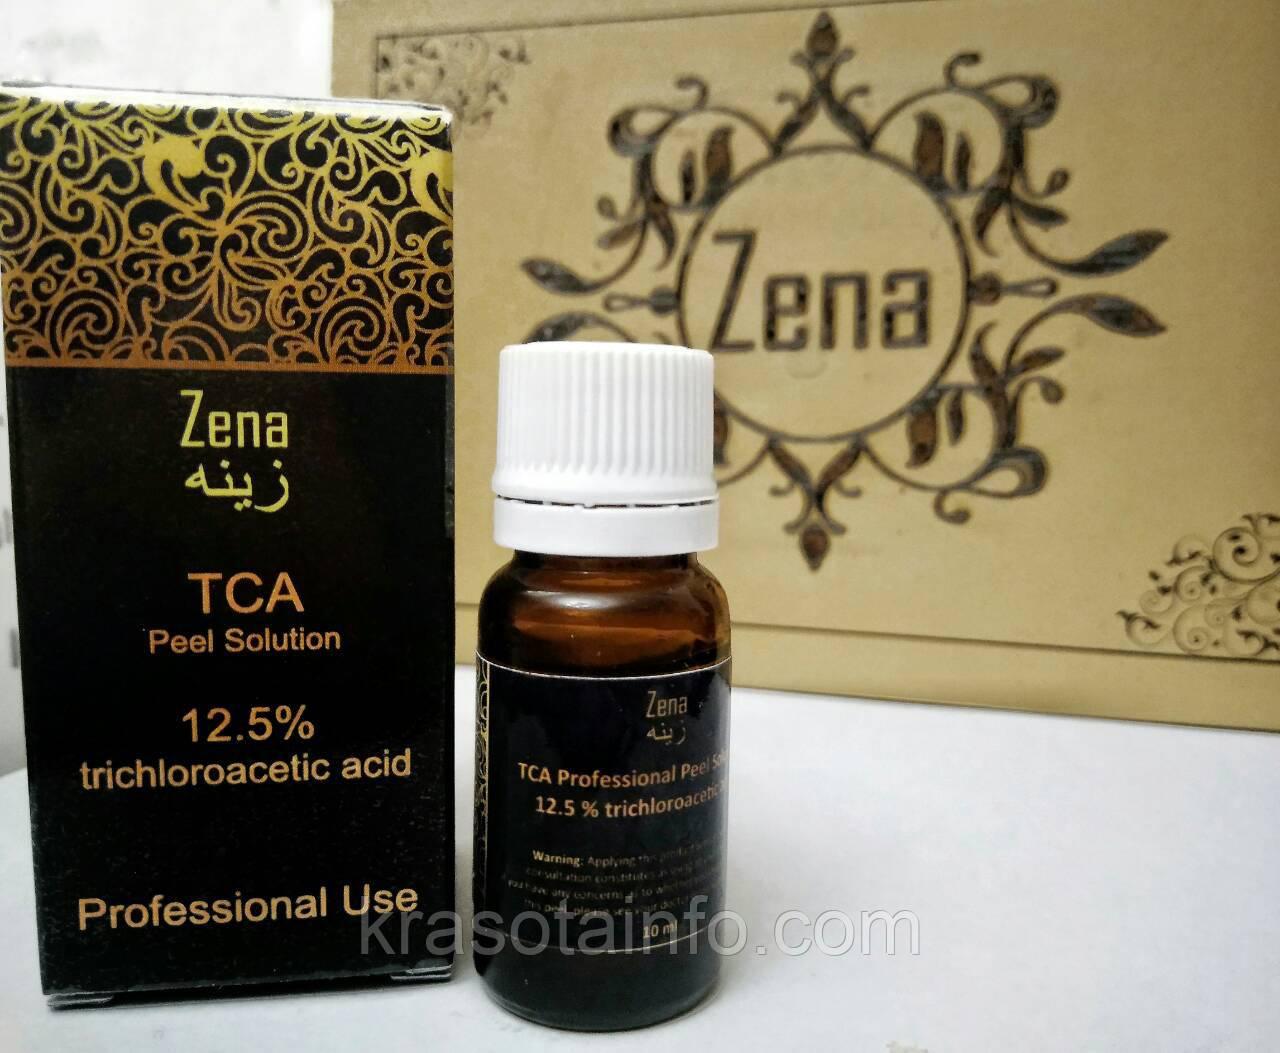 ТСА пилинг 12,5% - Трихлоруксусная кислота, Zena, 10 мл